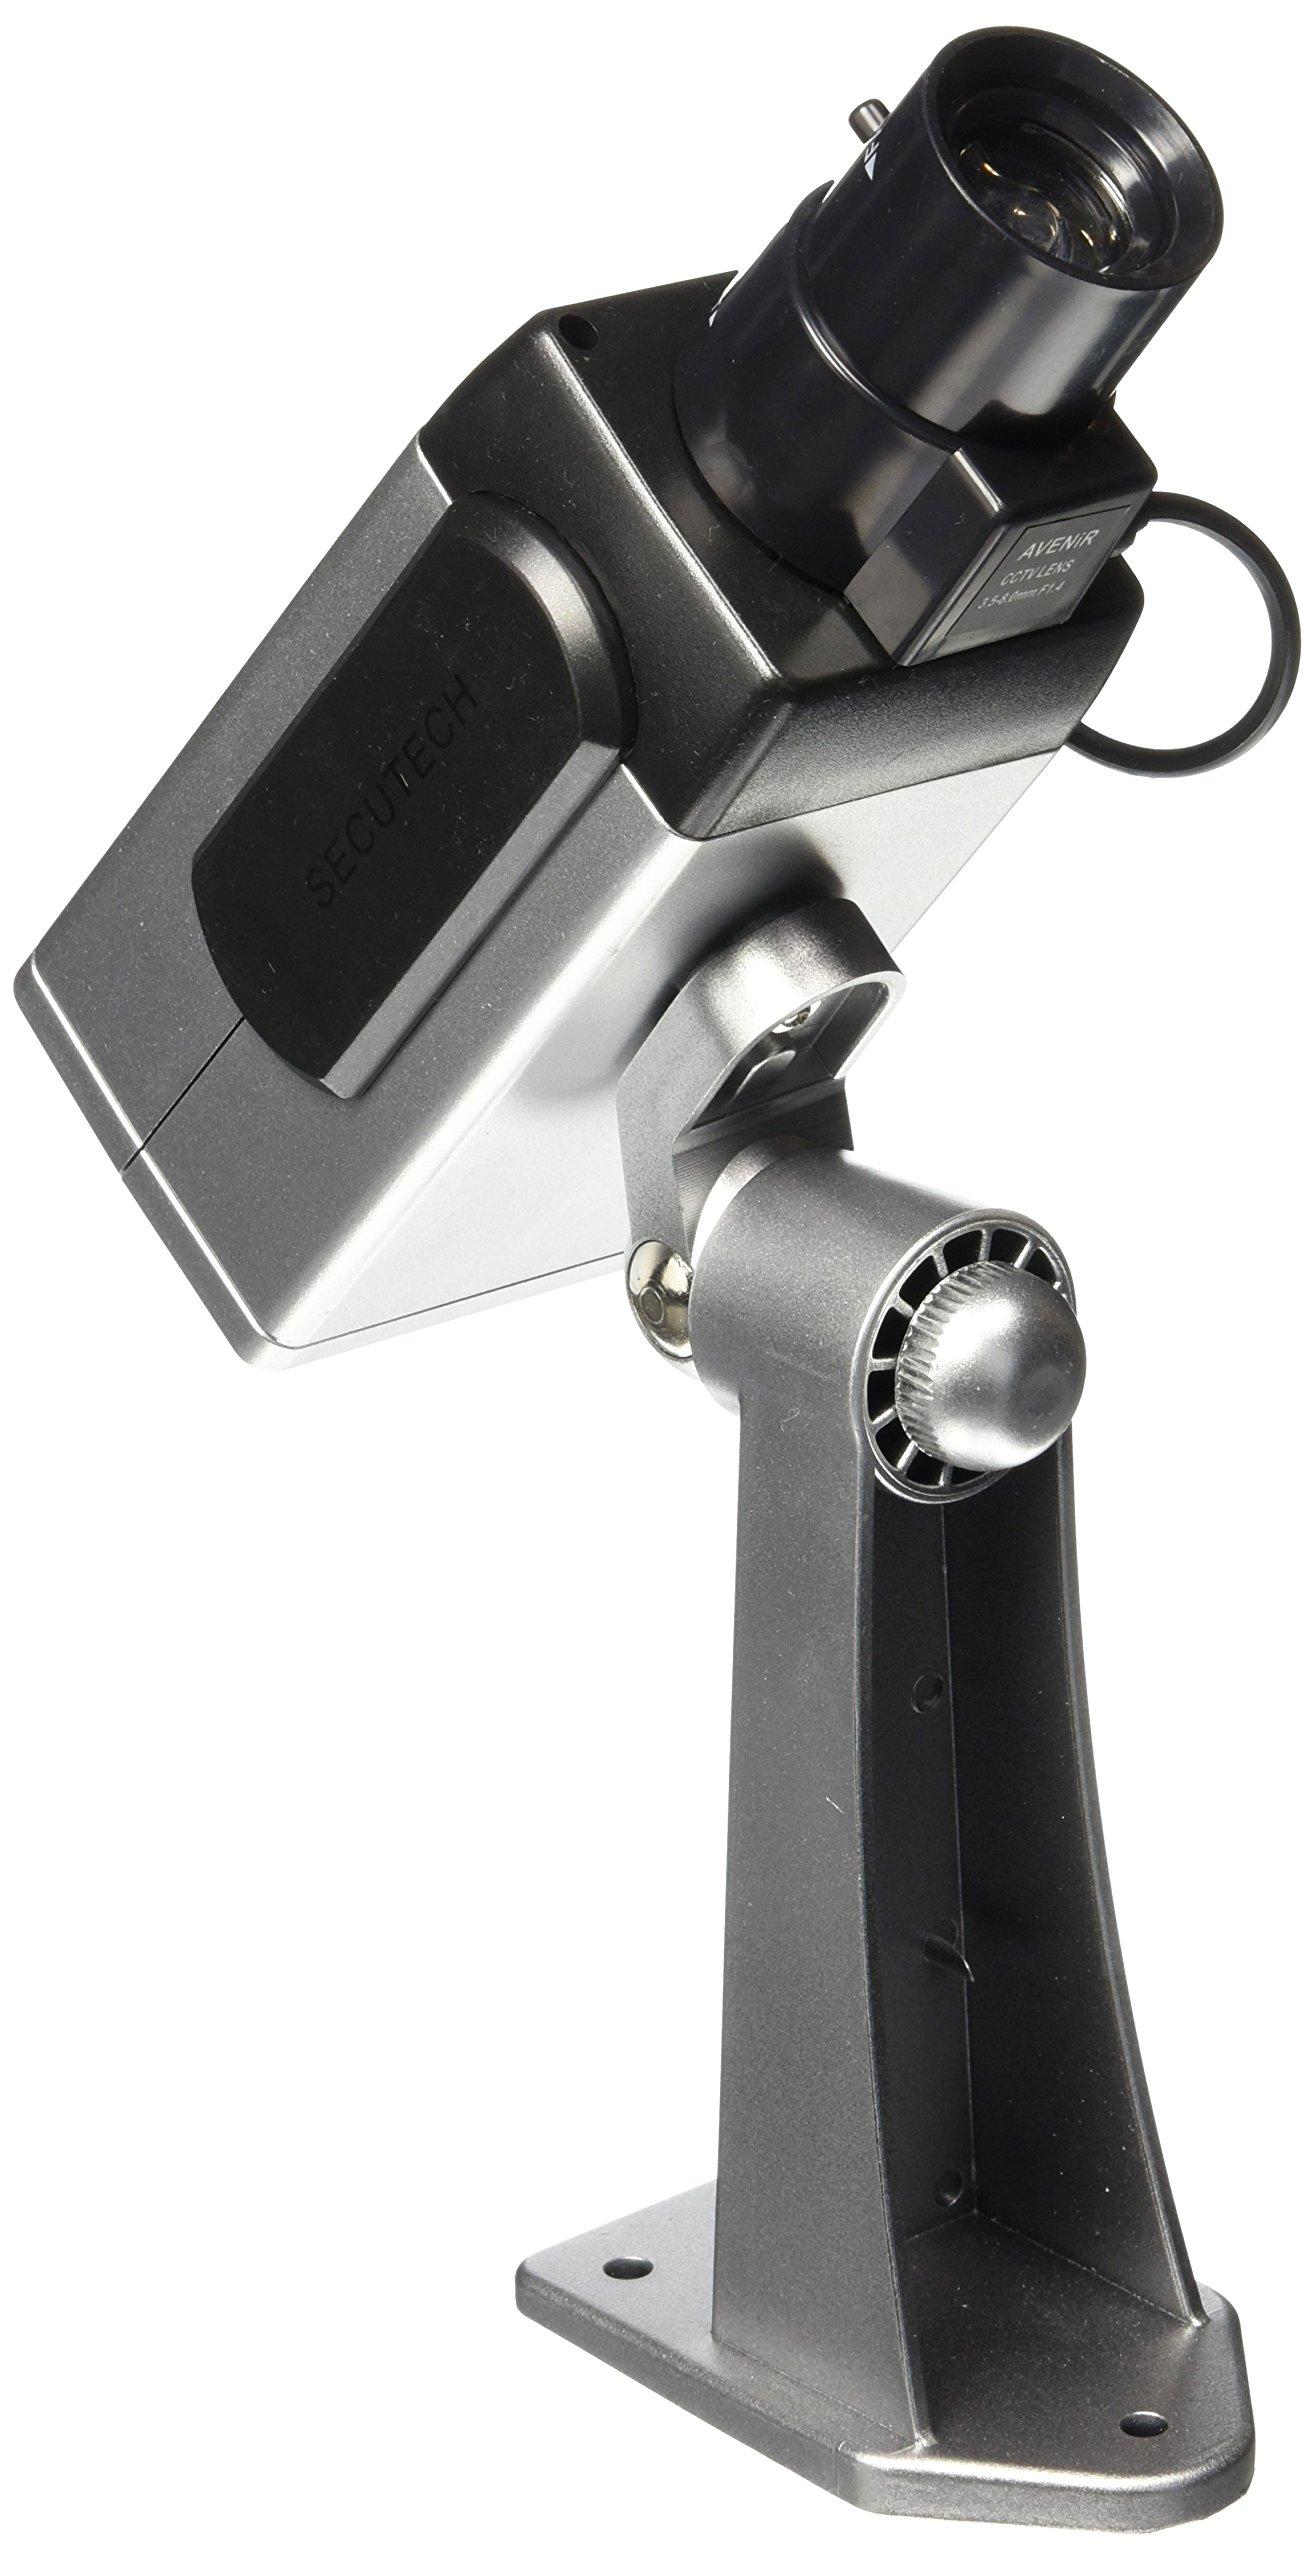 Sunforce 82341 Motion Decoy Camera